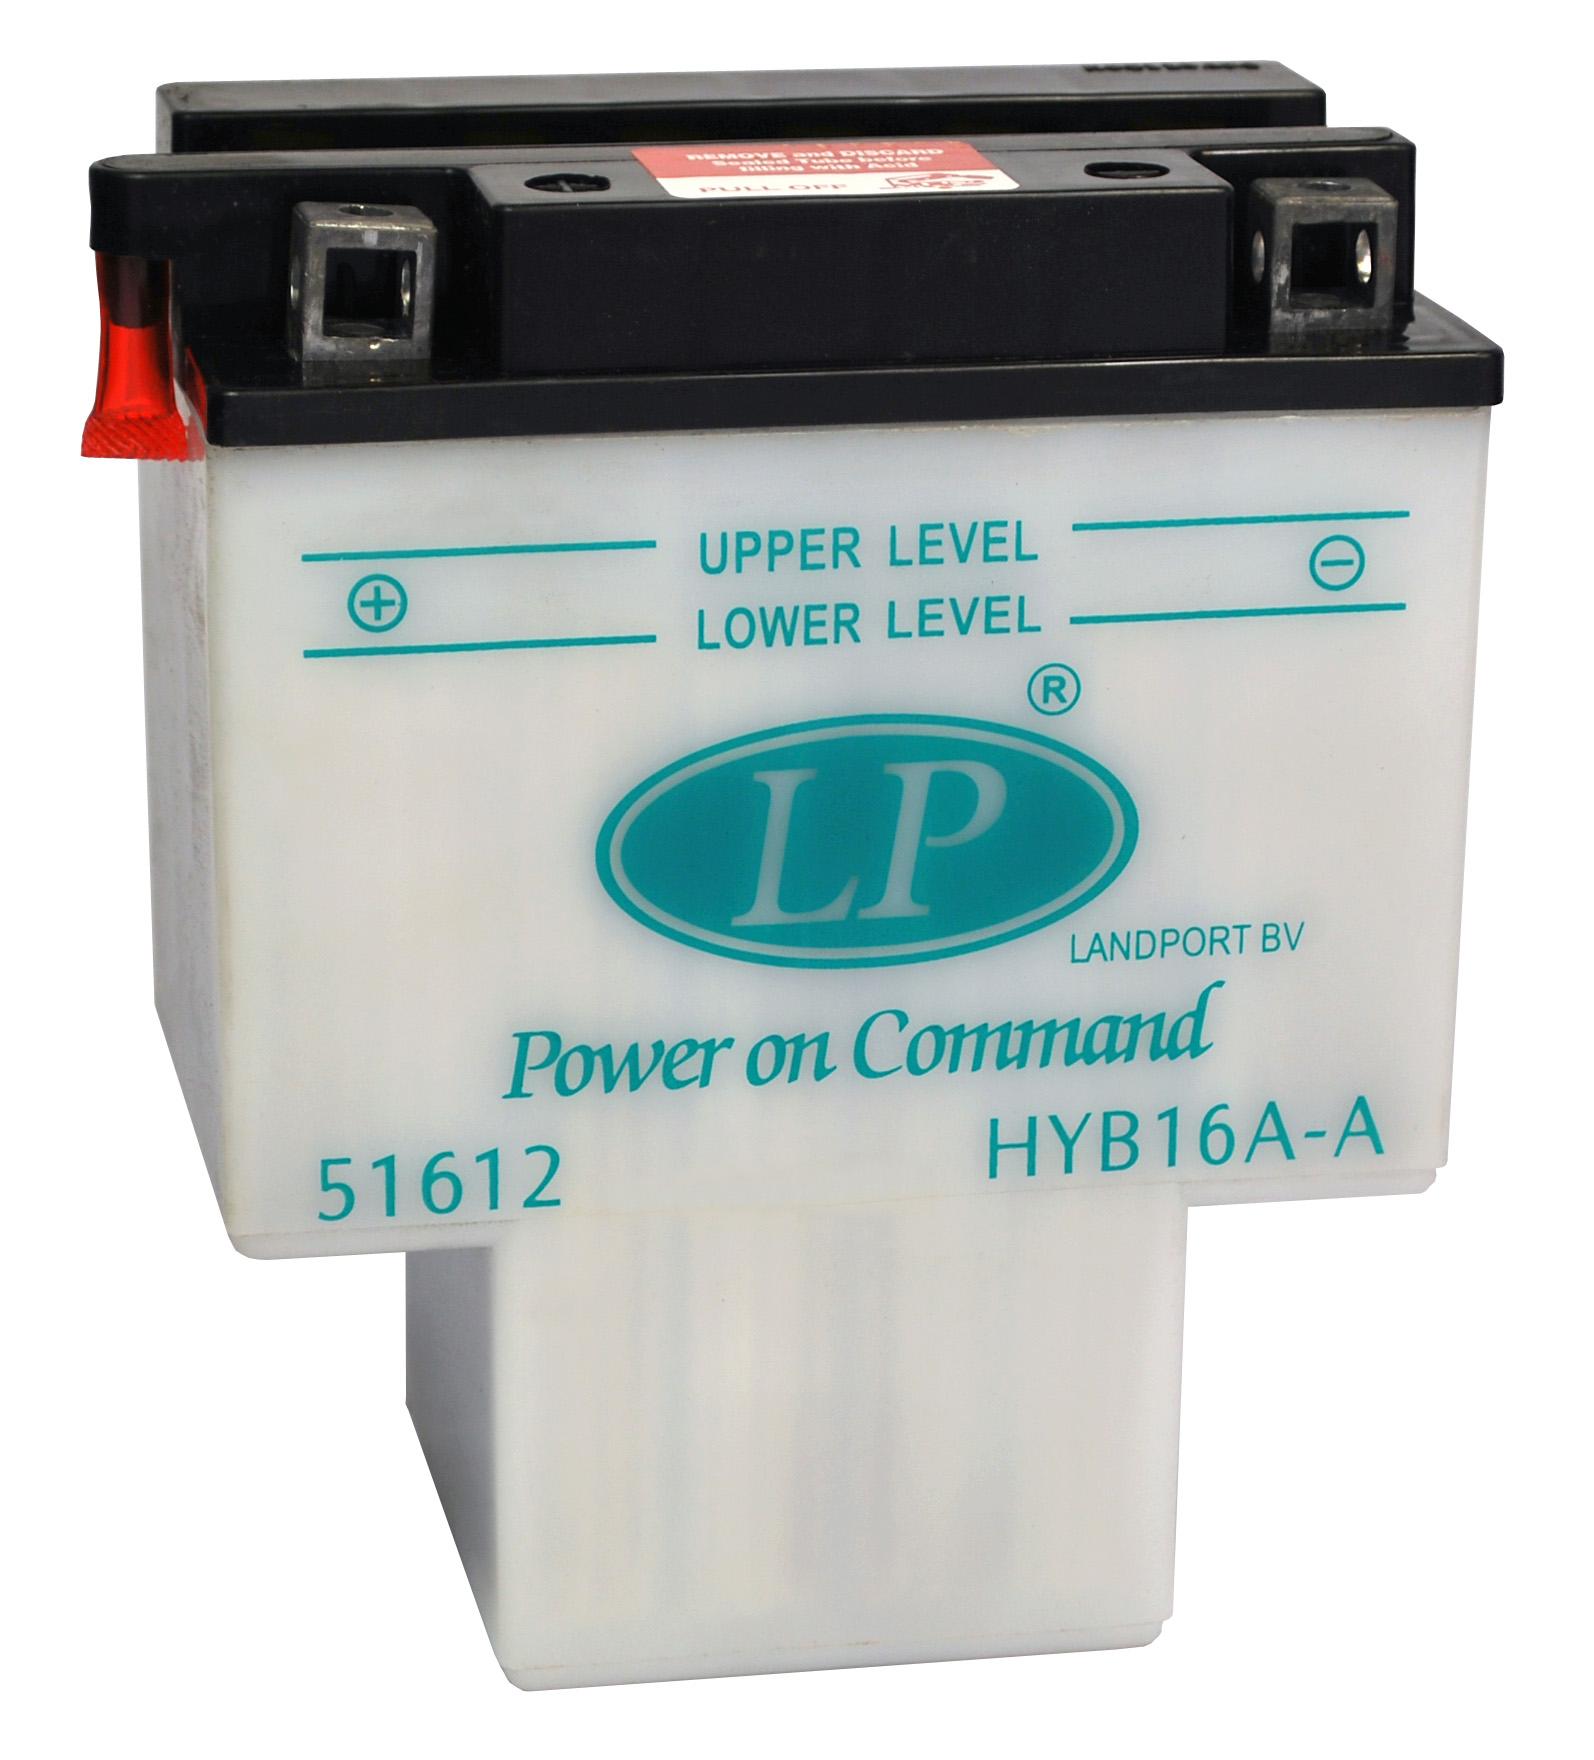 HYB16A-A motor accu met zuurpakket